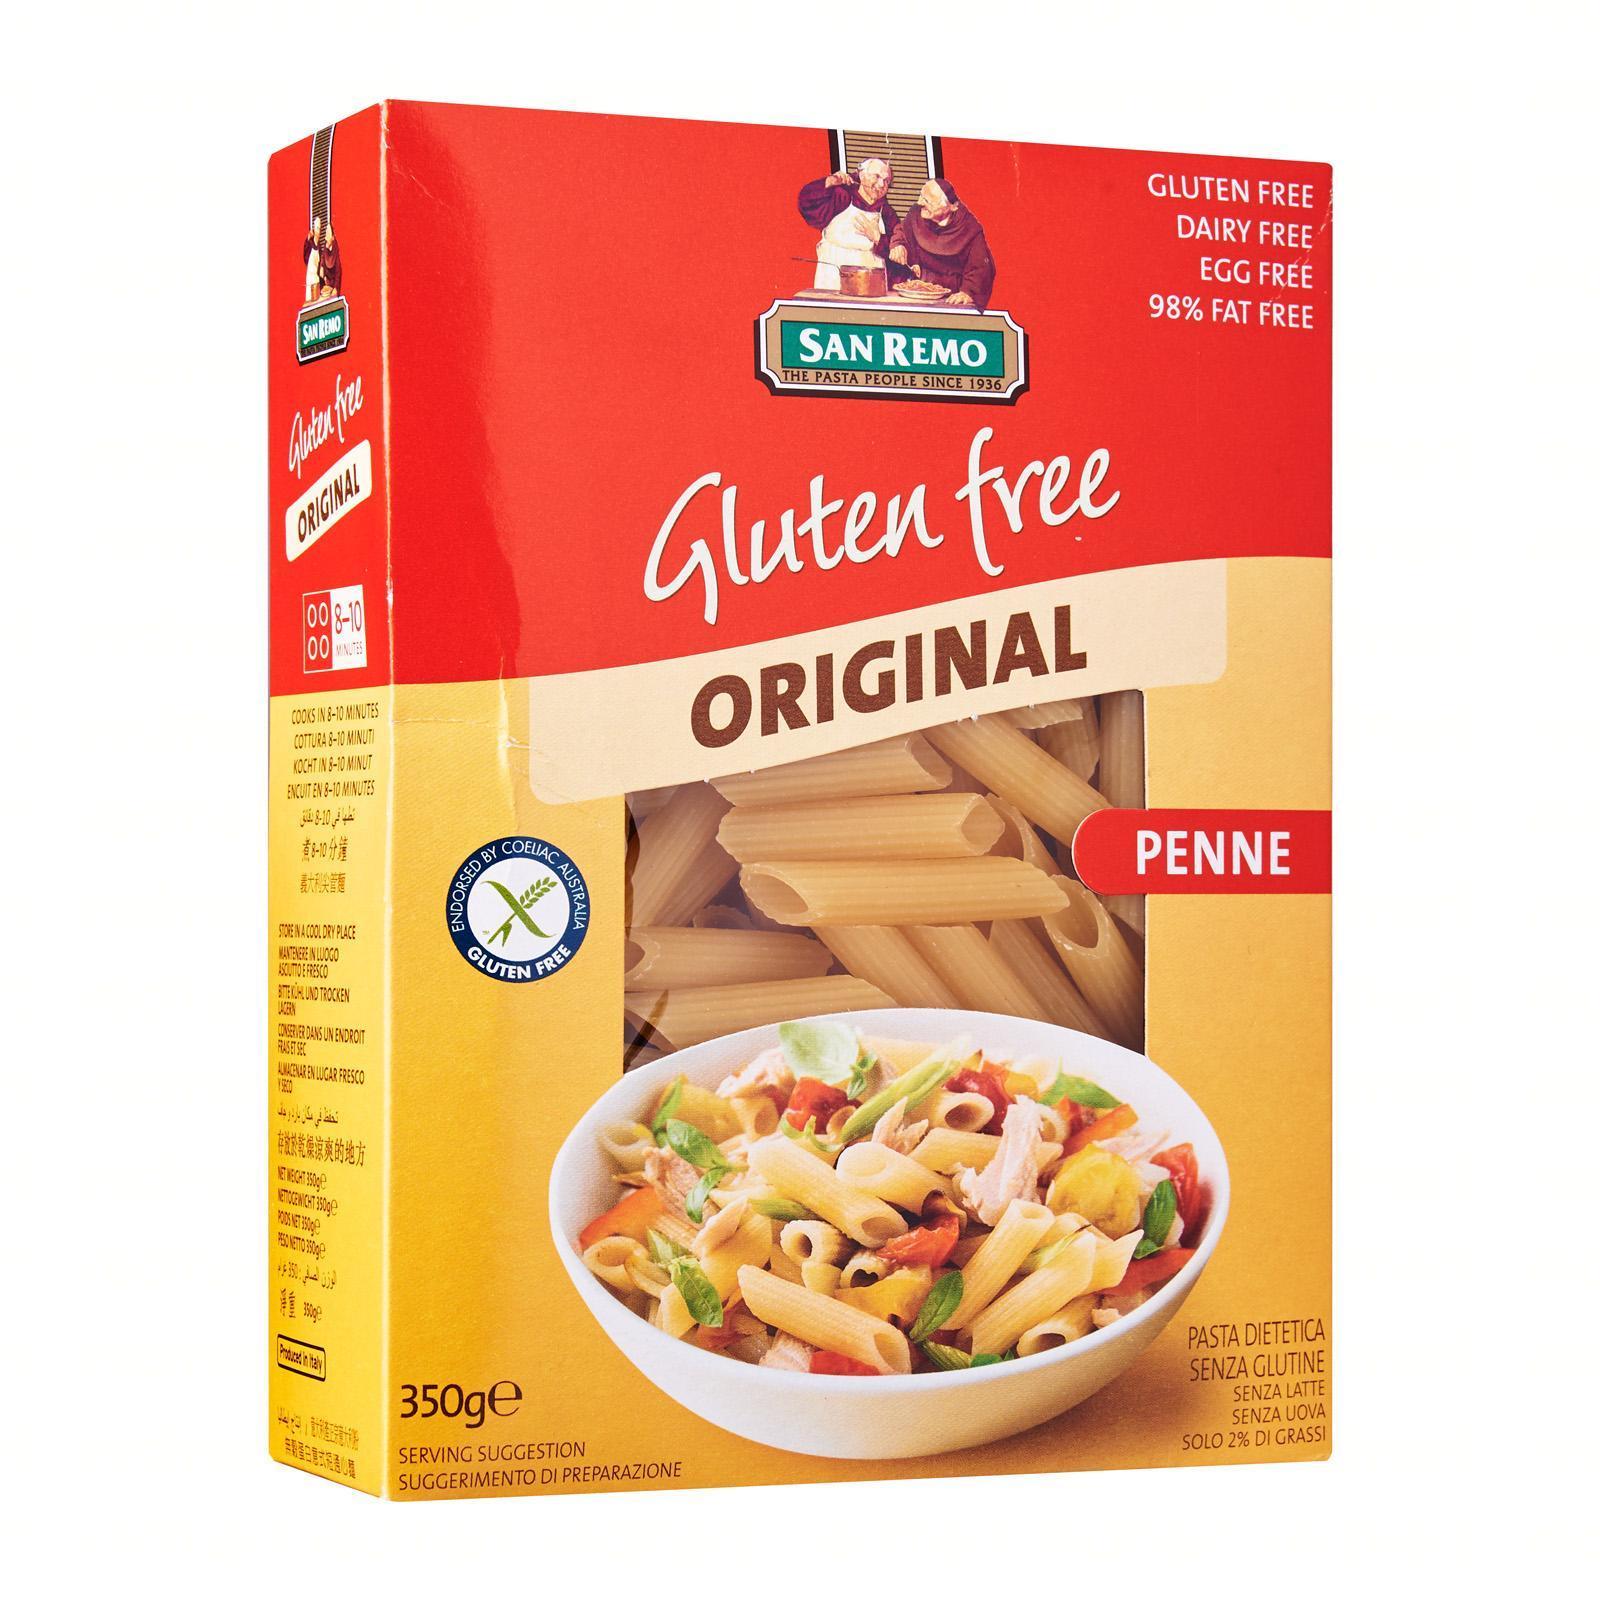 SAN REMO Gluten Free Penne 350g